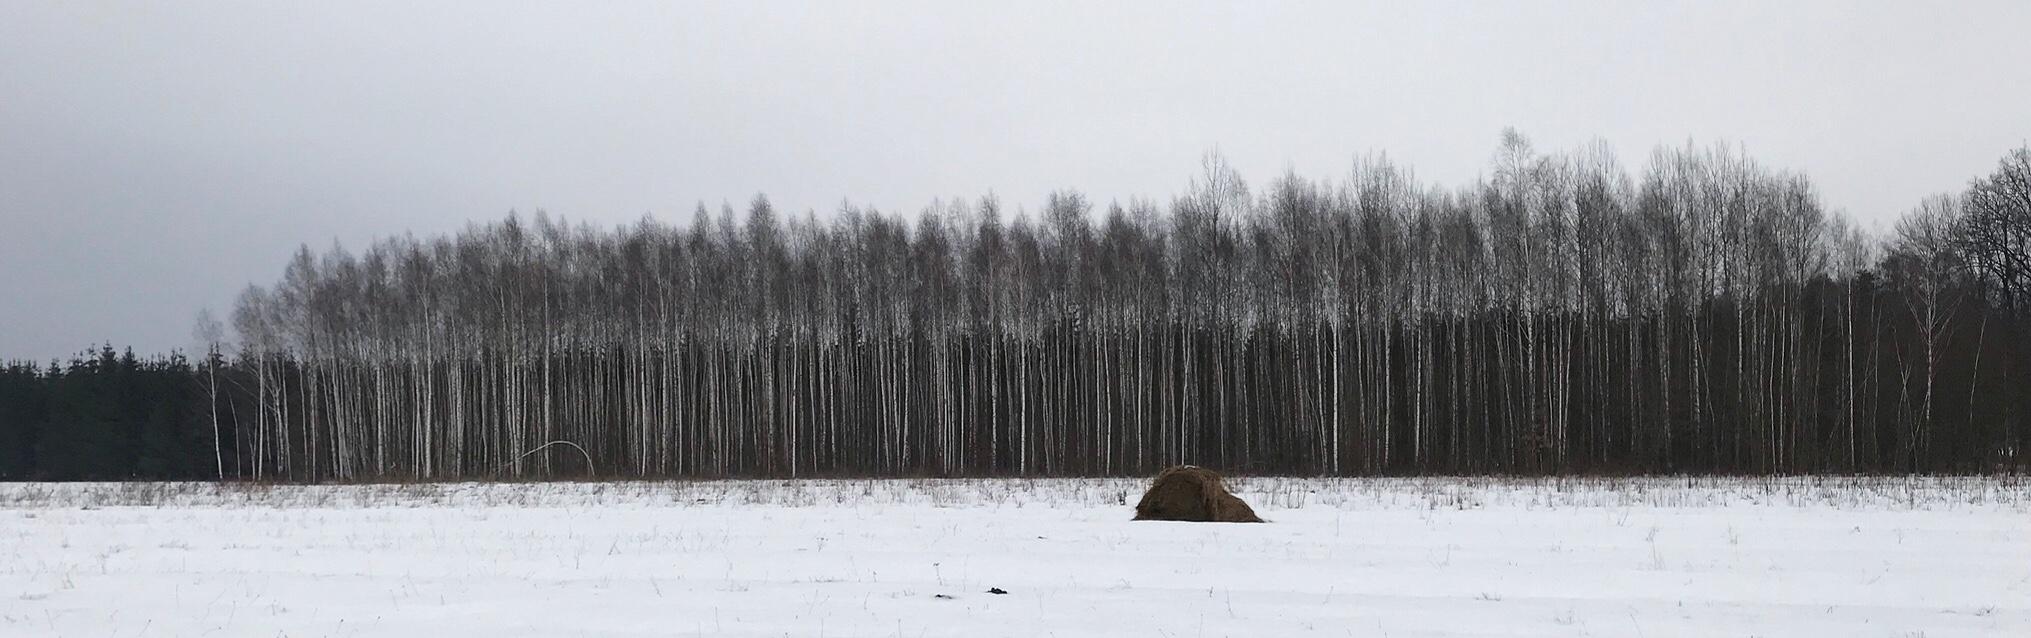 Birch-trees-bialowieza-forest.jpg